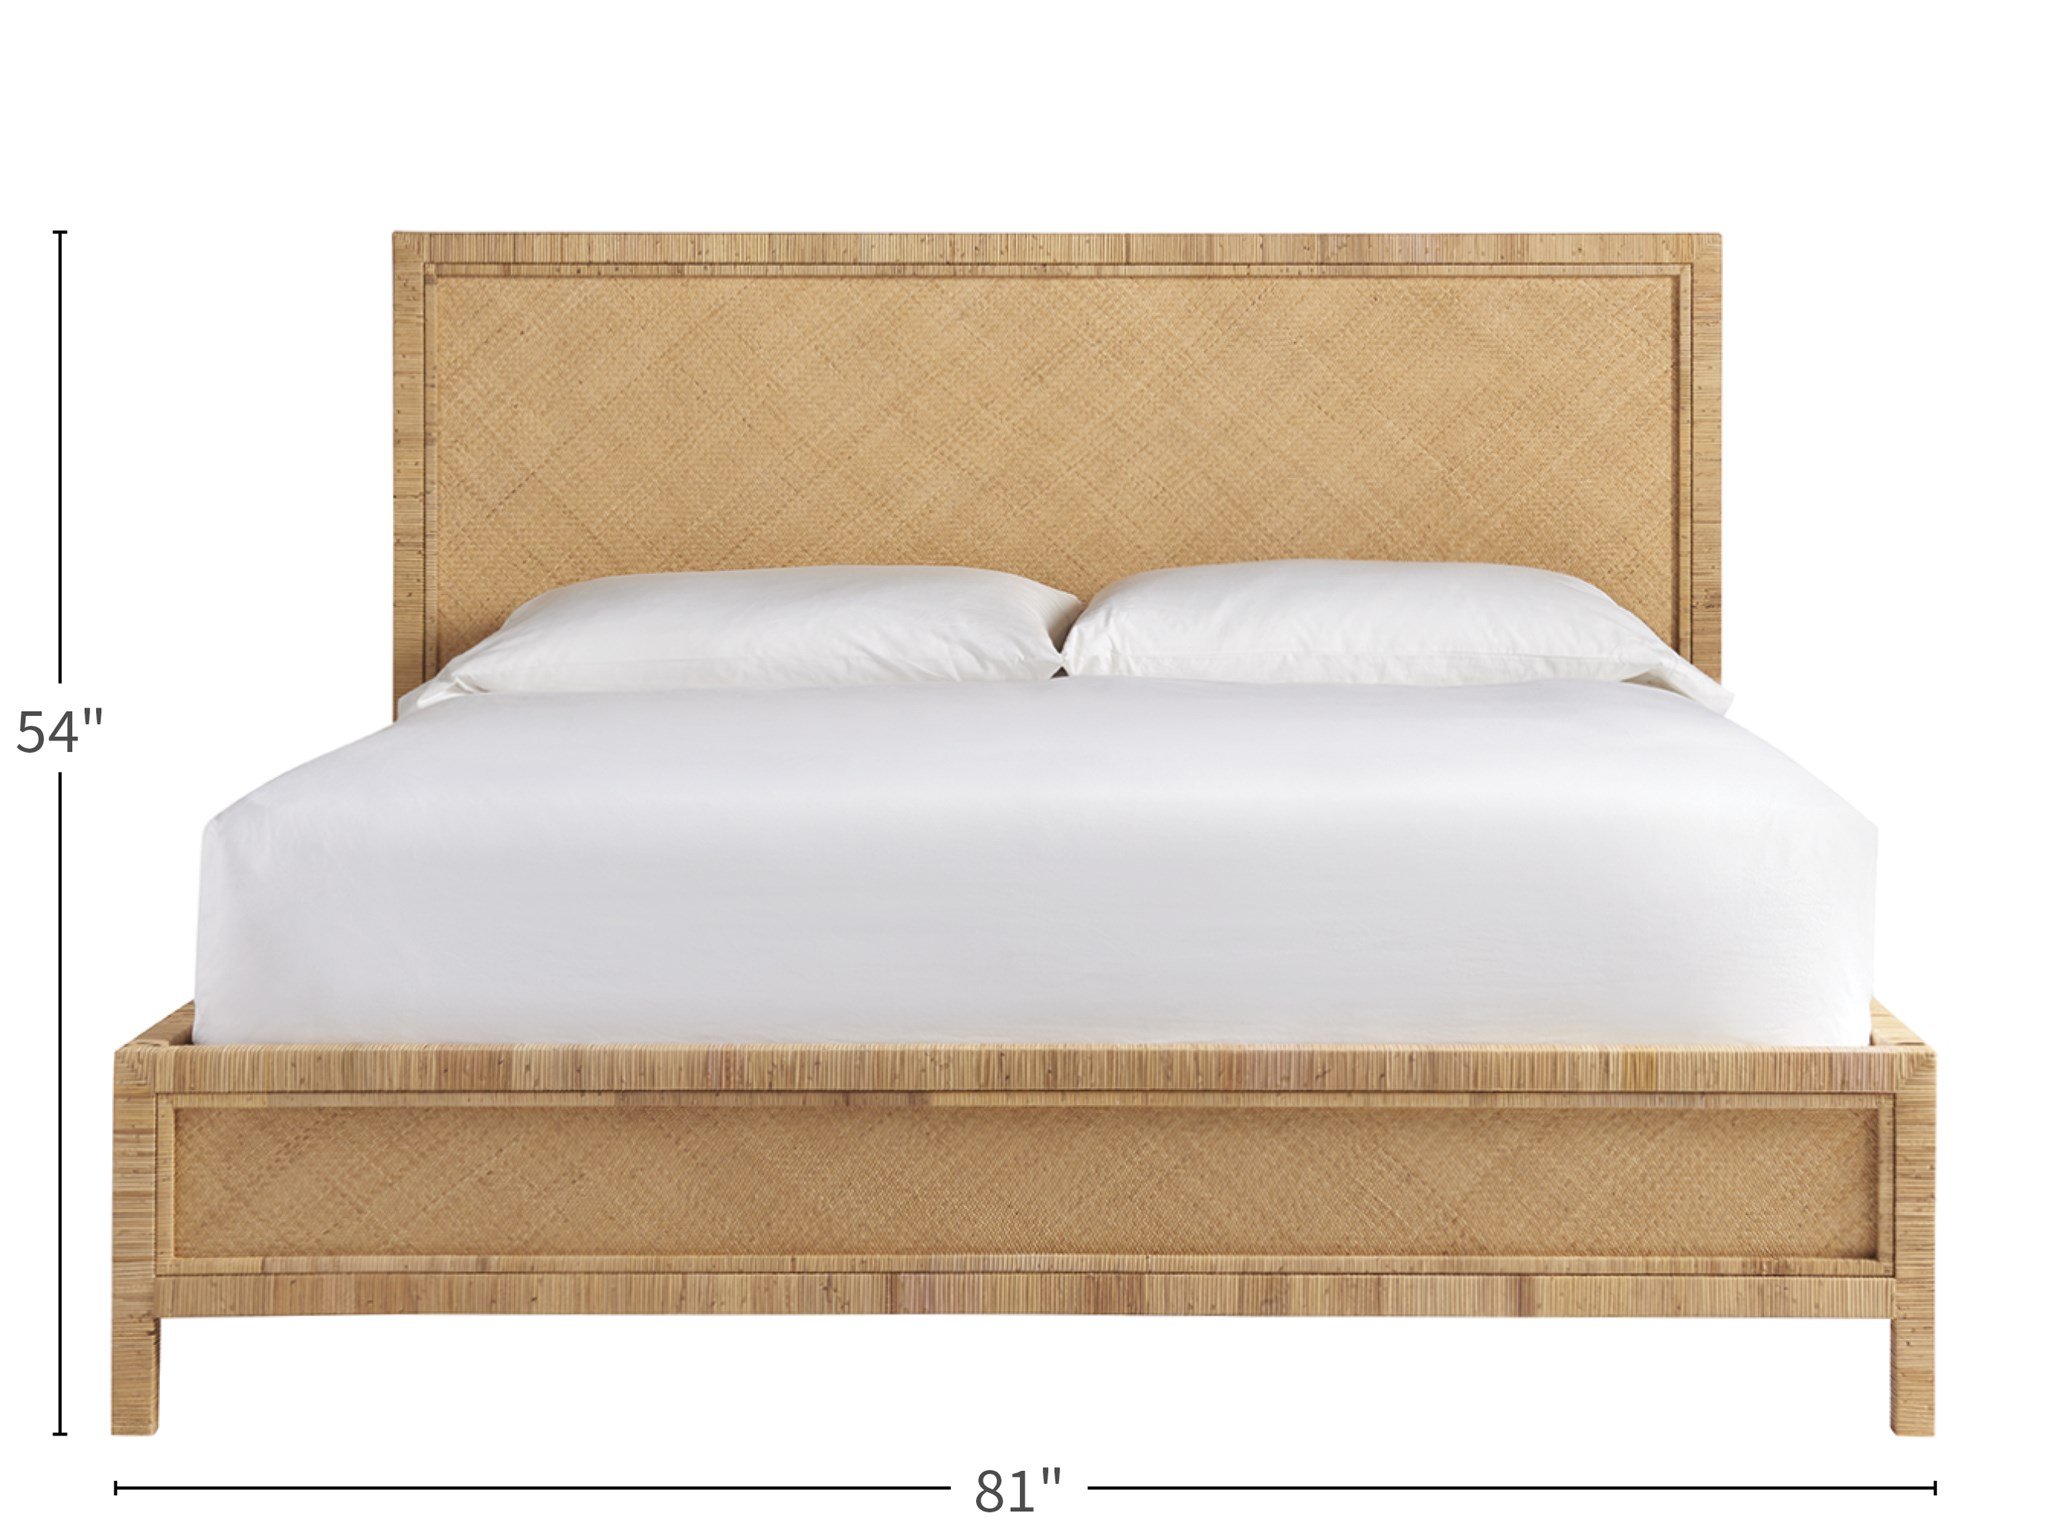 Long Key King Bed